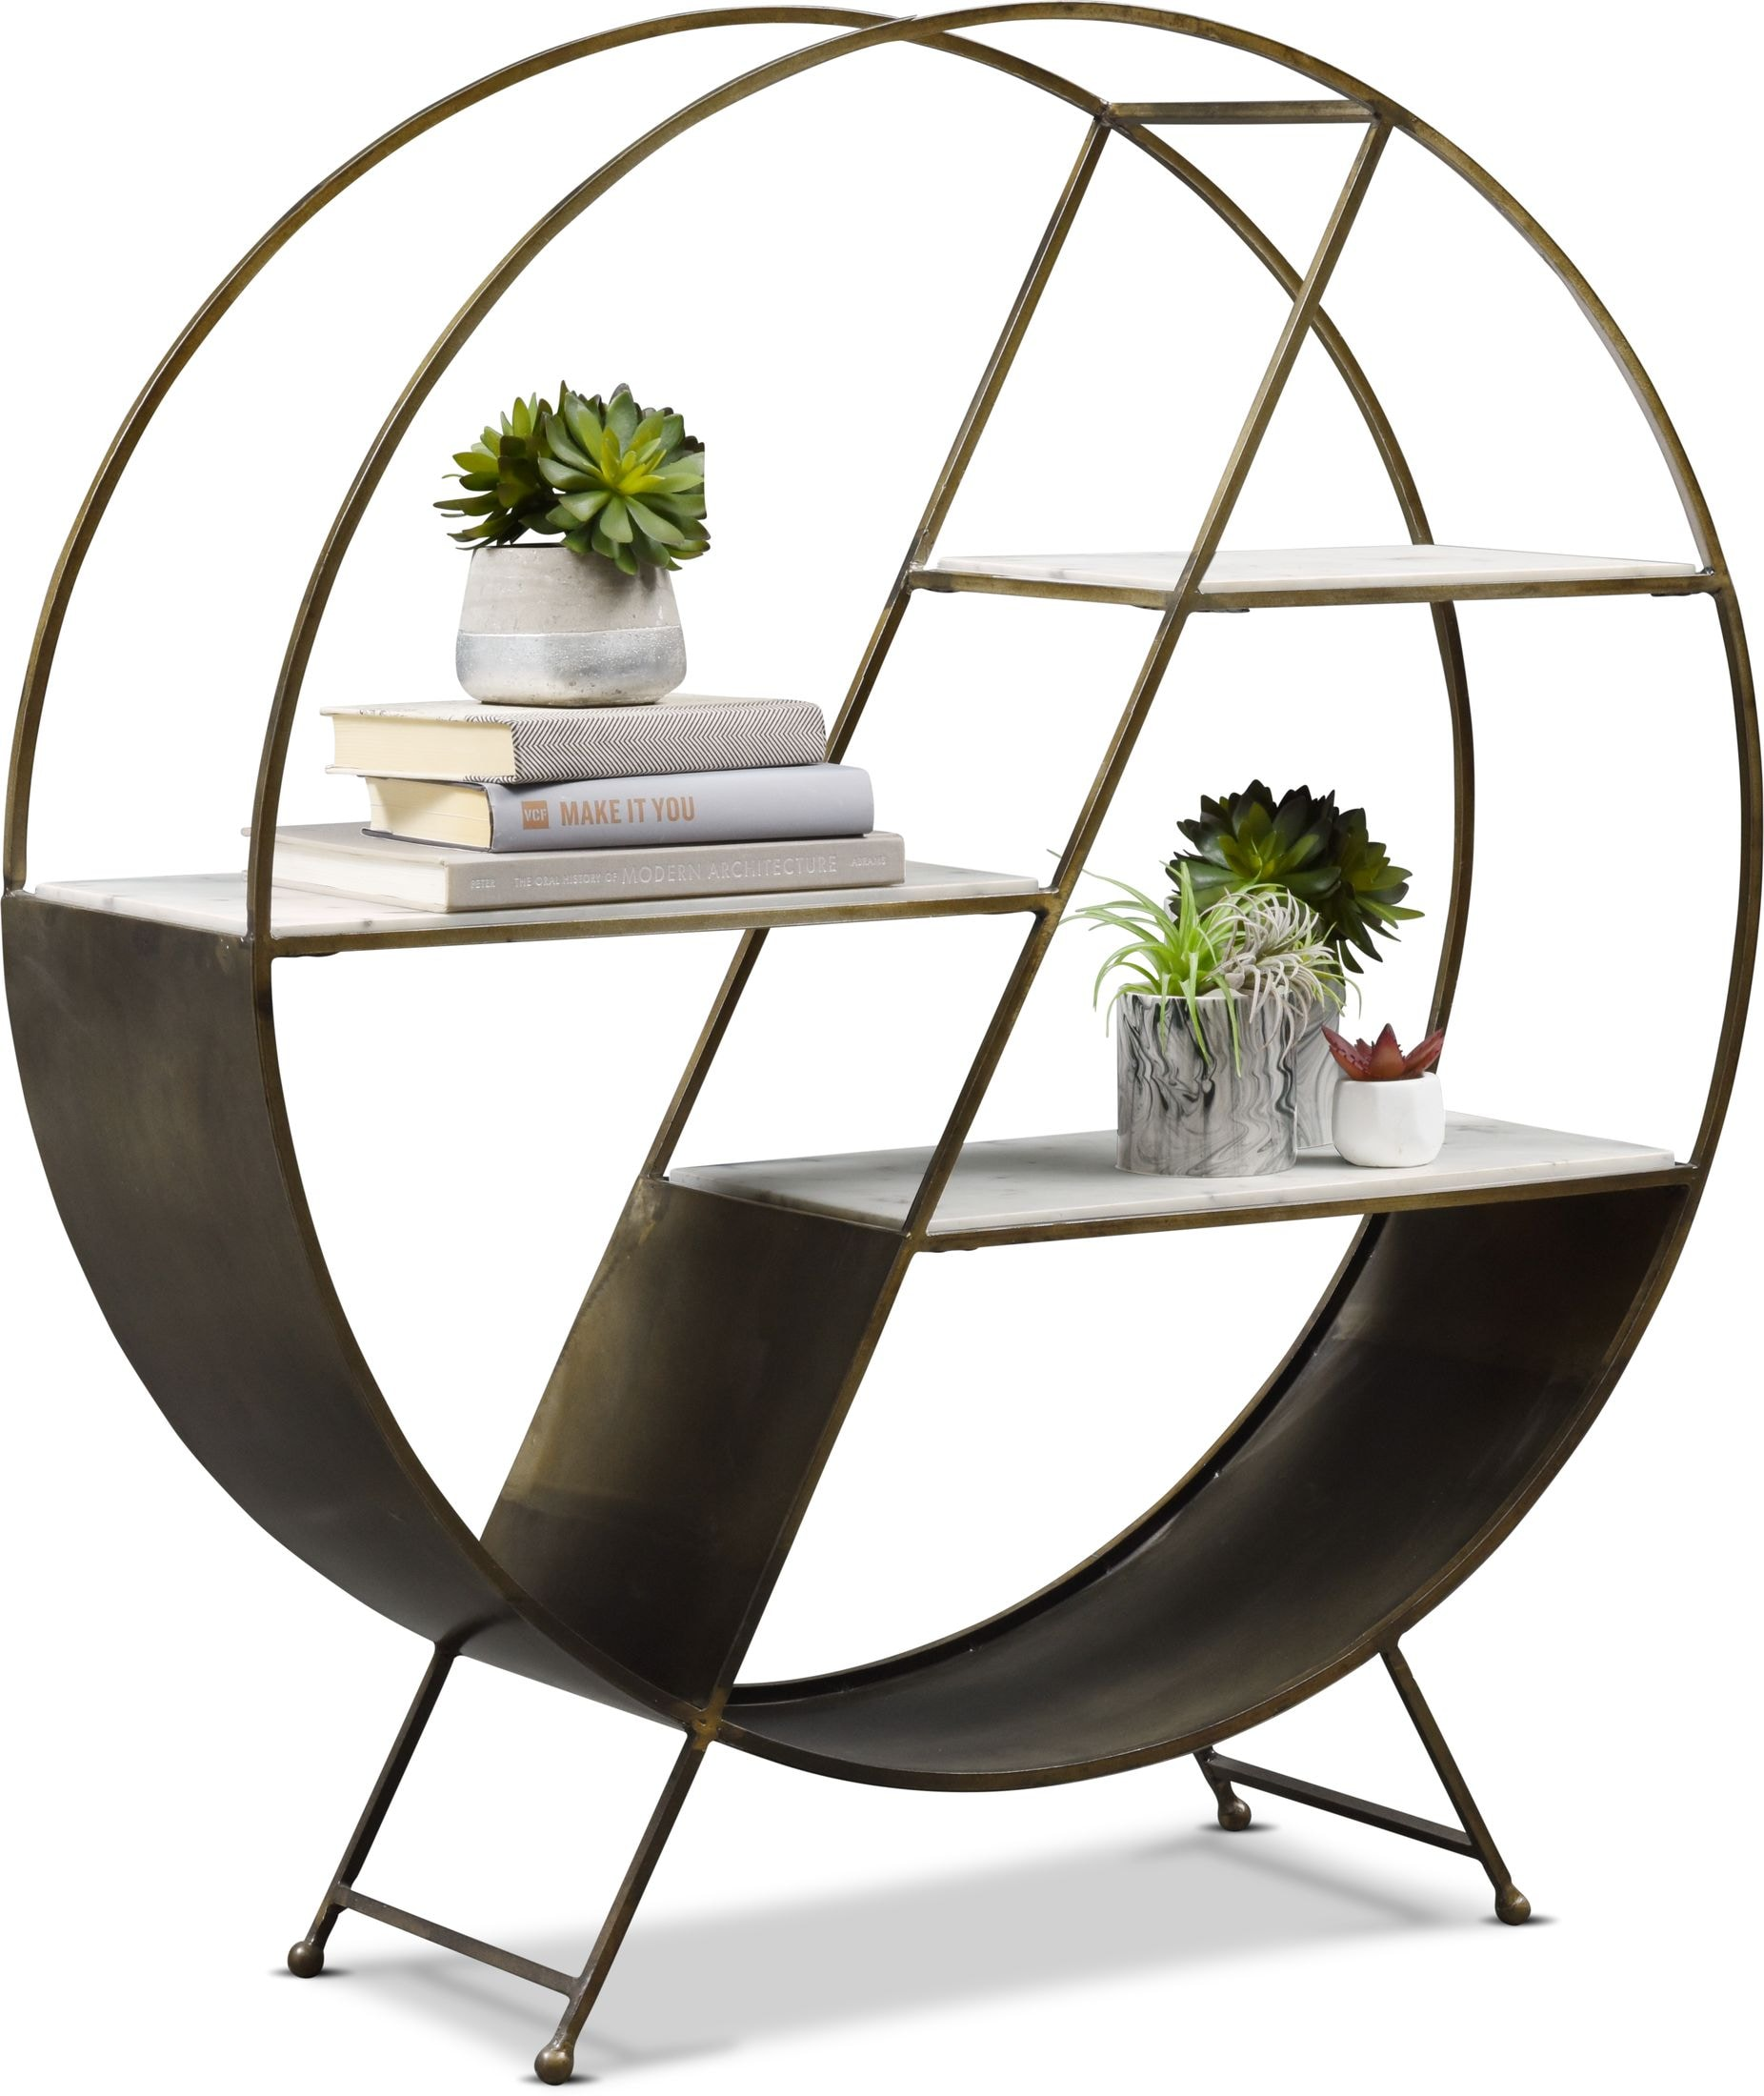 Home Office Furniture - Owen Bookcase